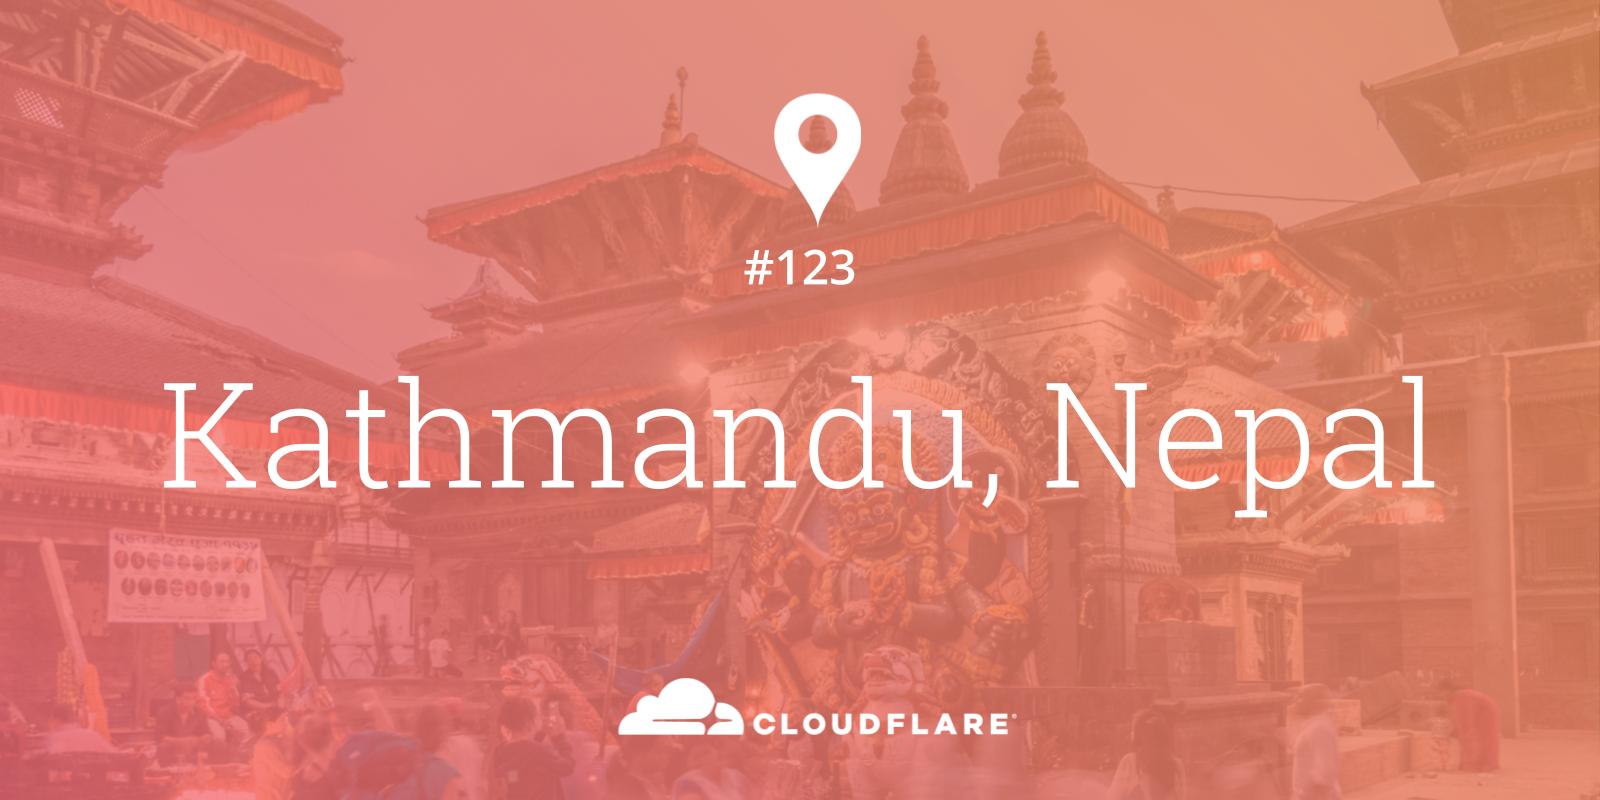 Kathmandu, Nepal is data center 123